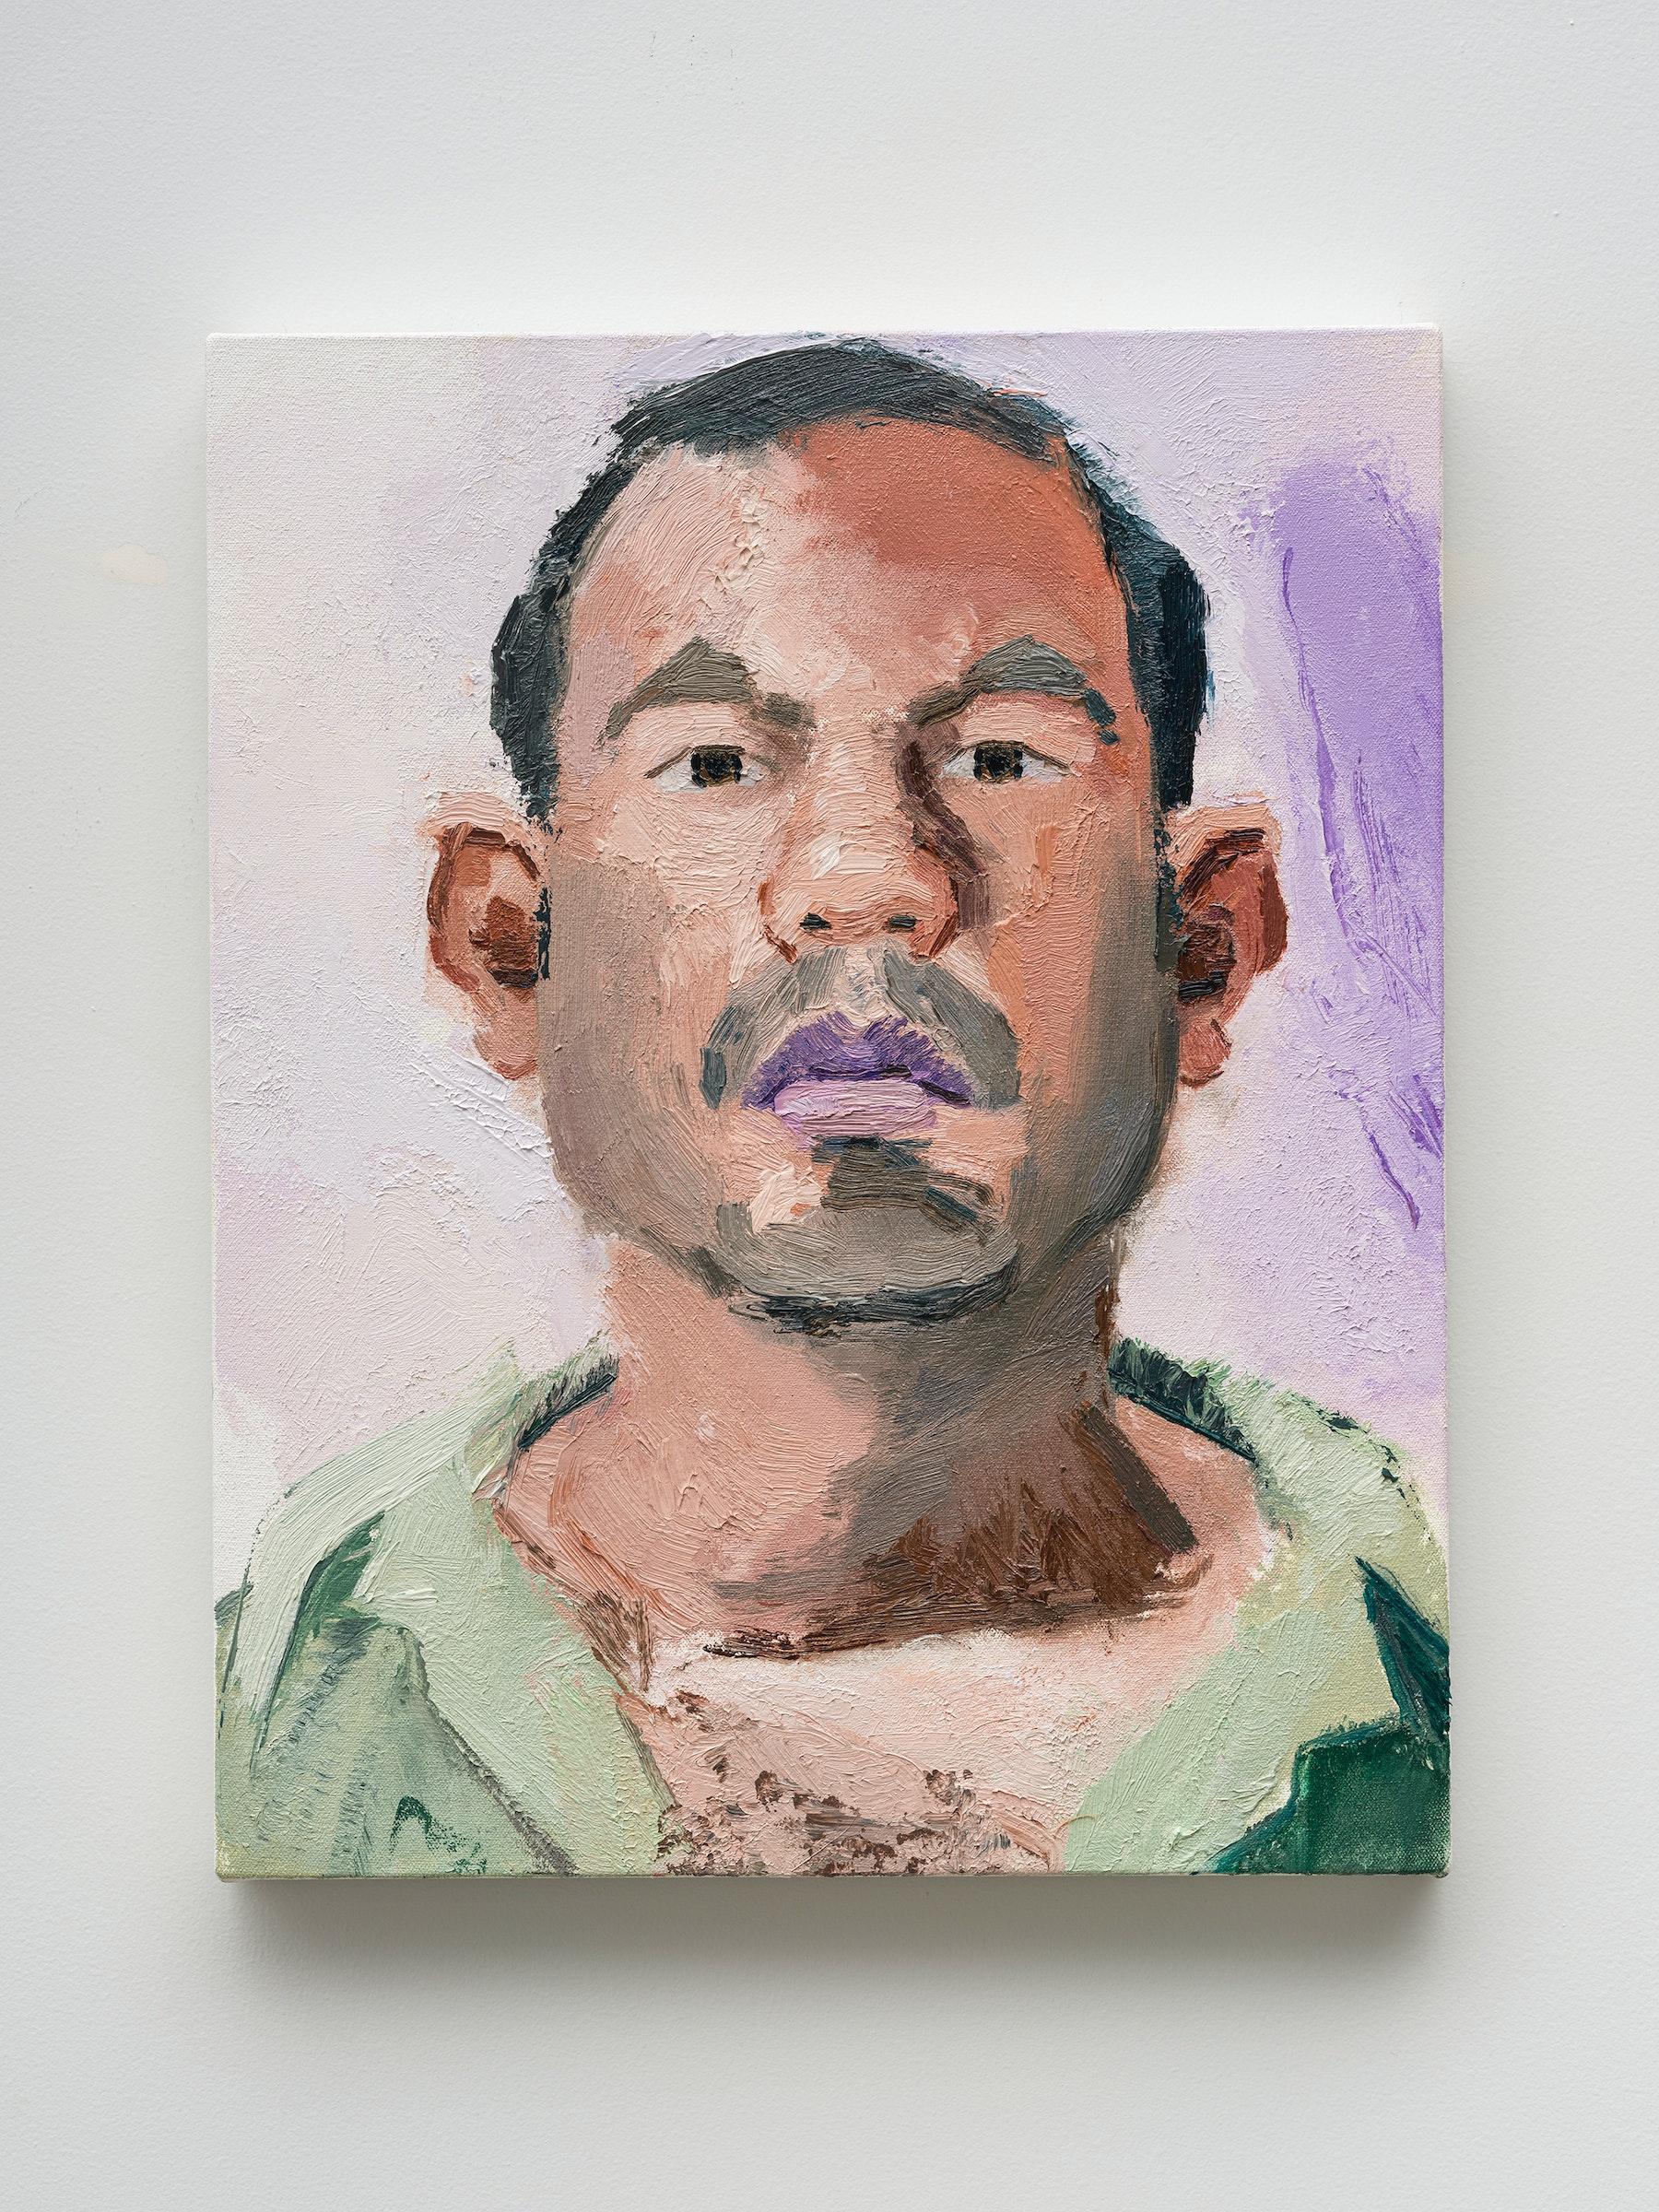 "John Sonsini ""Gabriel,"" 2020 Oil on canvas 20"" x 16"" [HxW] (50.8 x 40.64 cm) Inventory #SON128 Courtesy of the artist and Vielmetter Los Angeles Photo credit: Jeff Mclane"